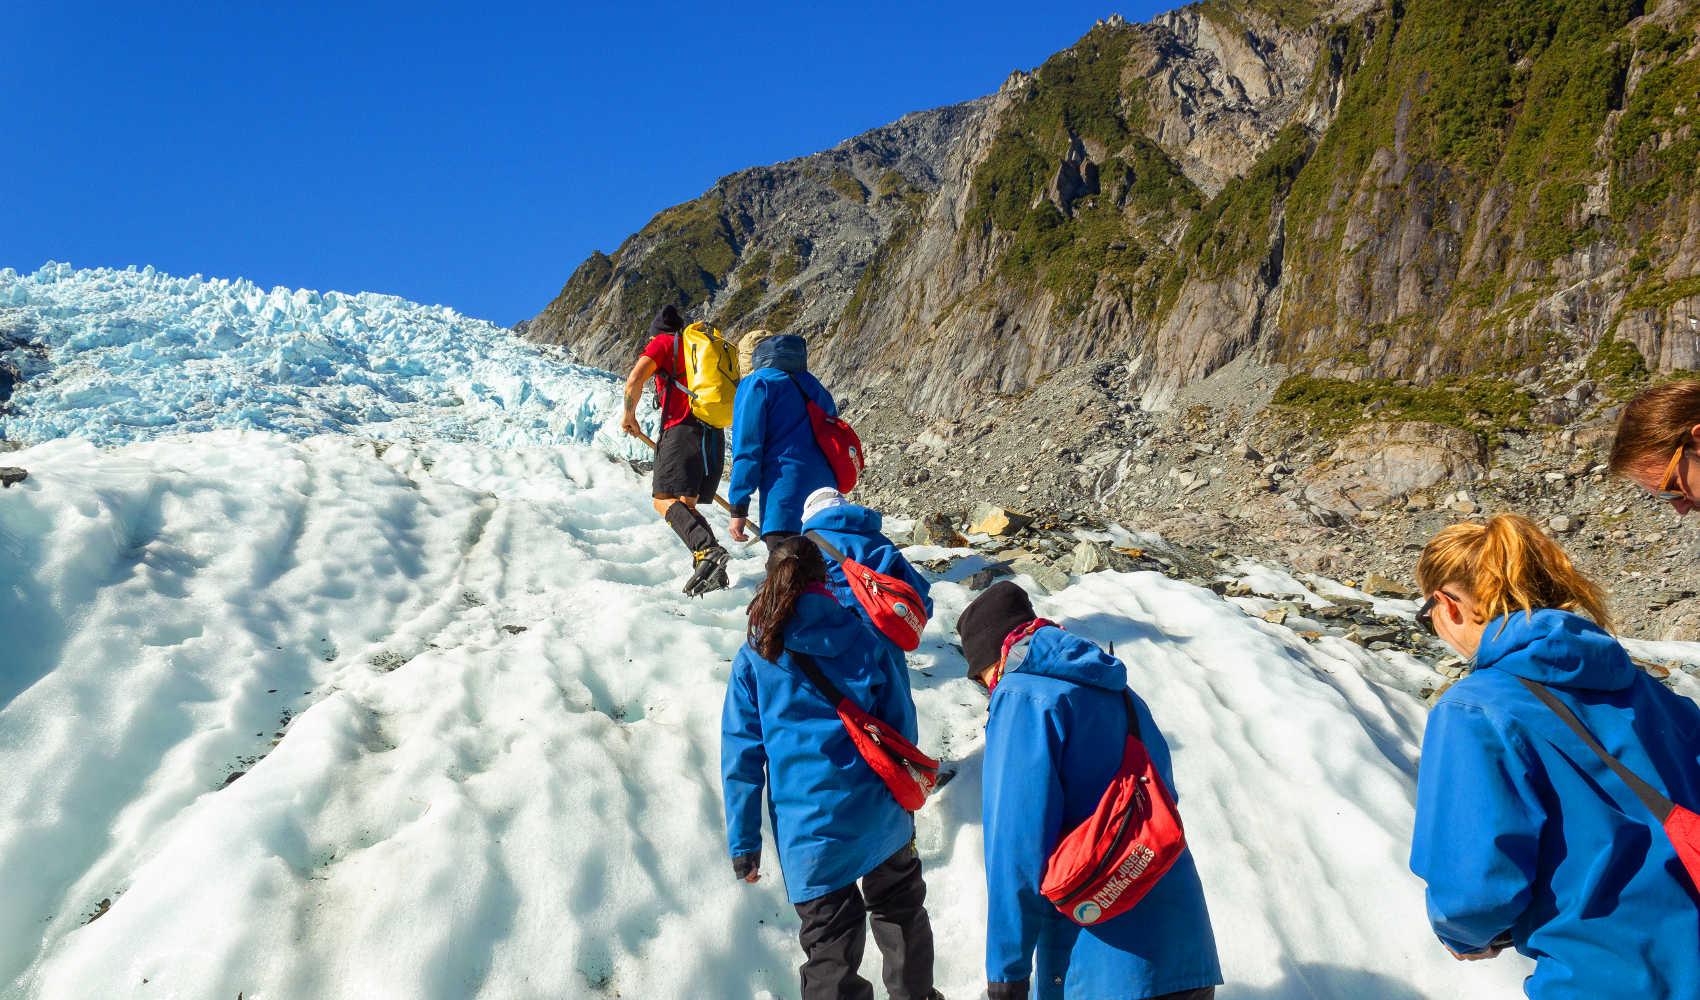 Franz Josef, New Zealand. A group of tourists hiking on Franz Josef Glacier